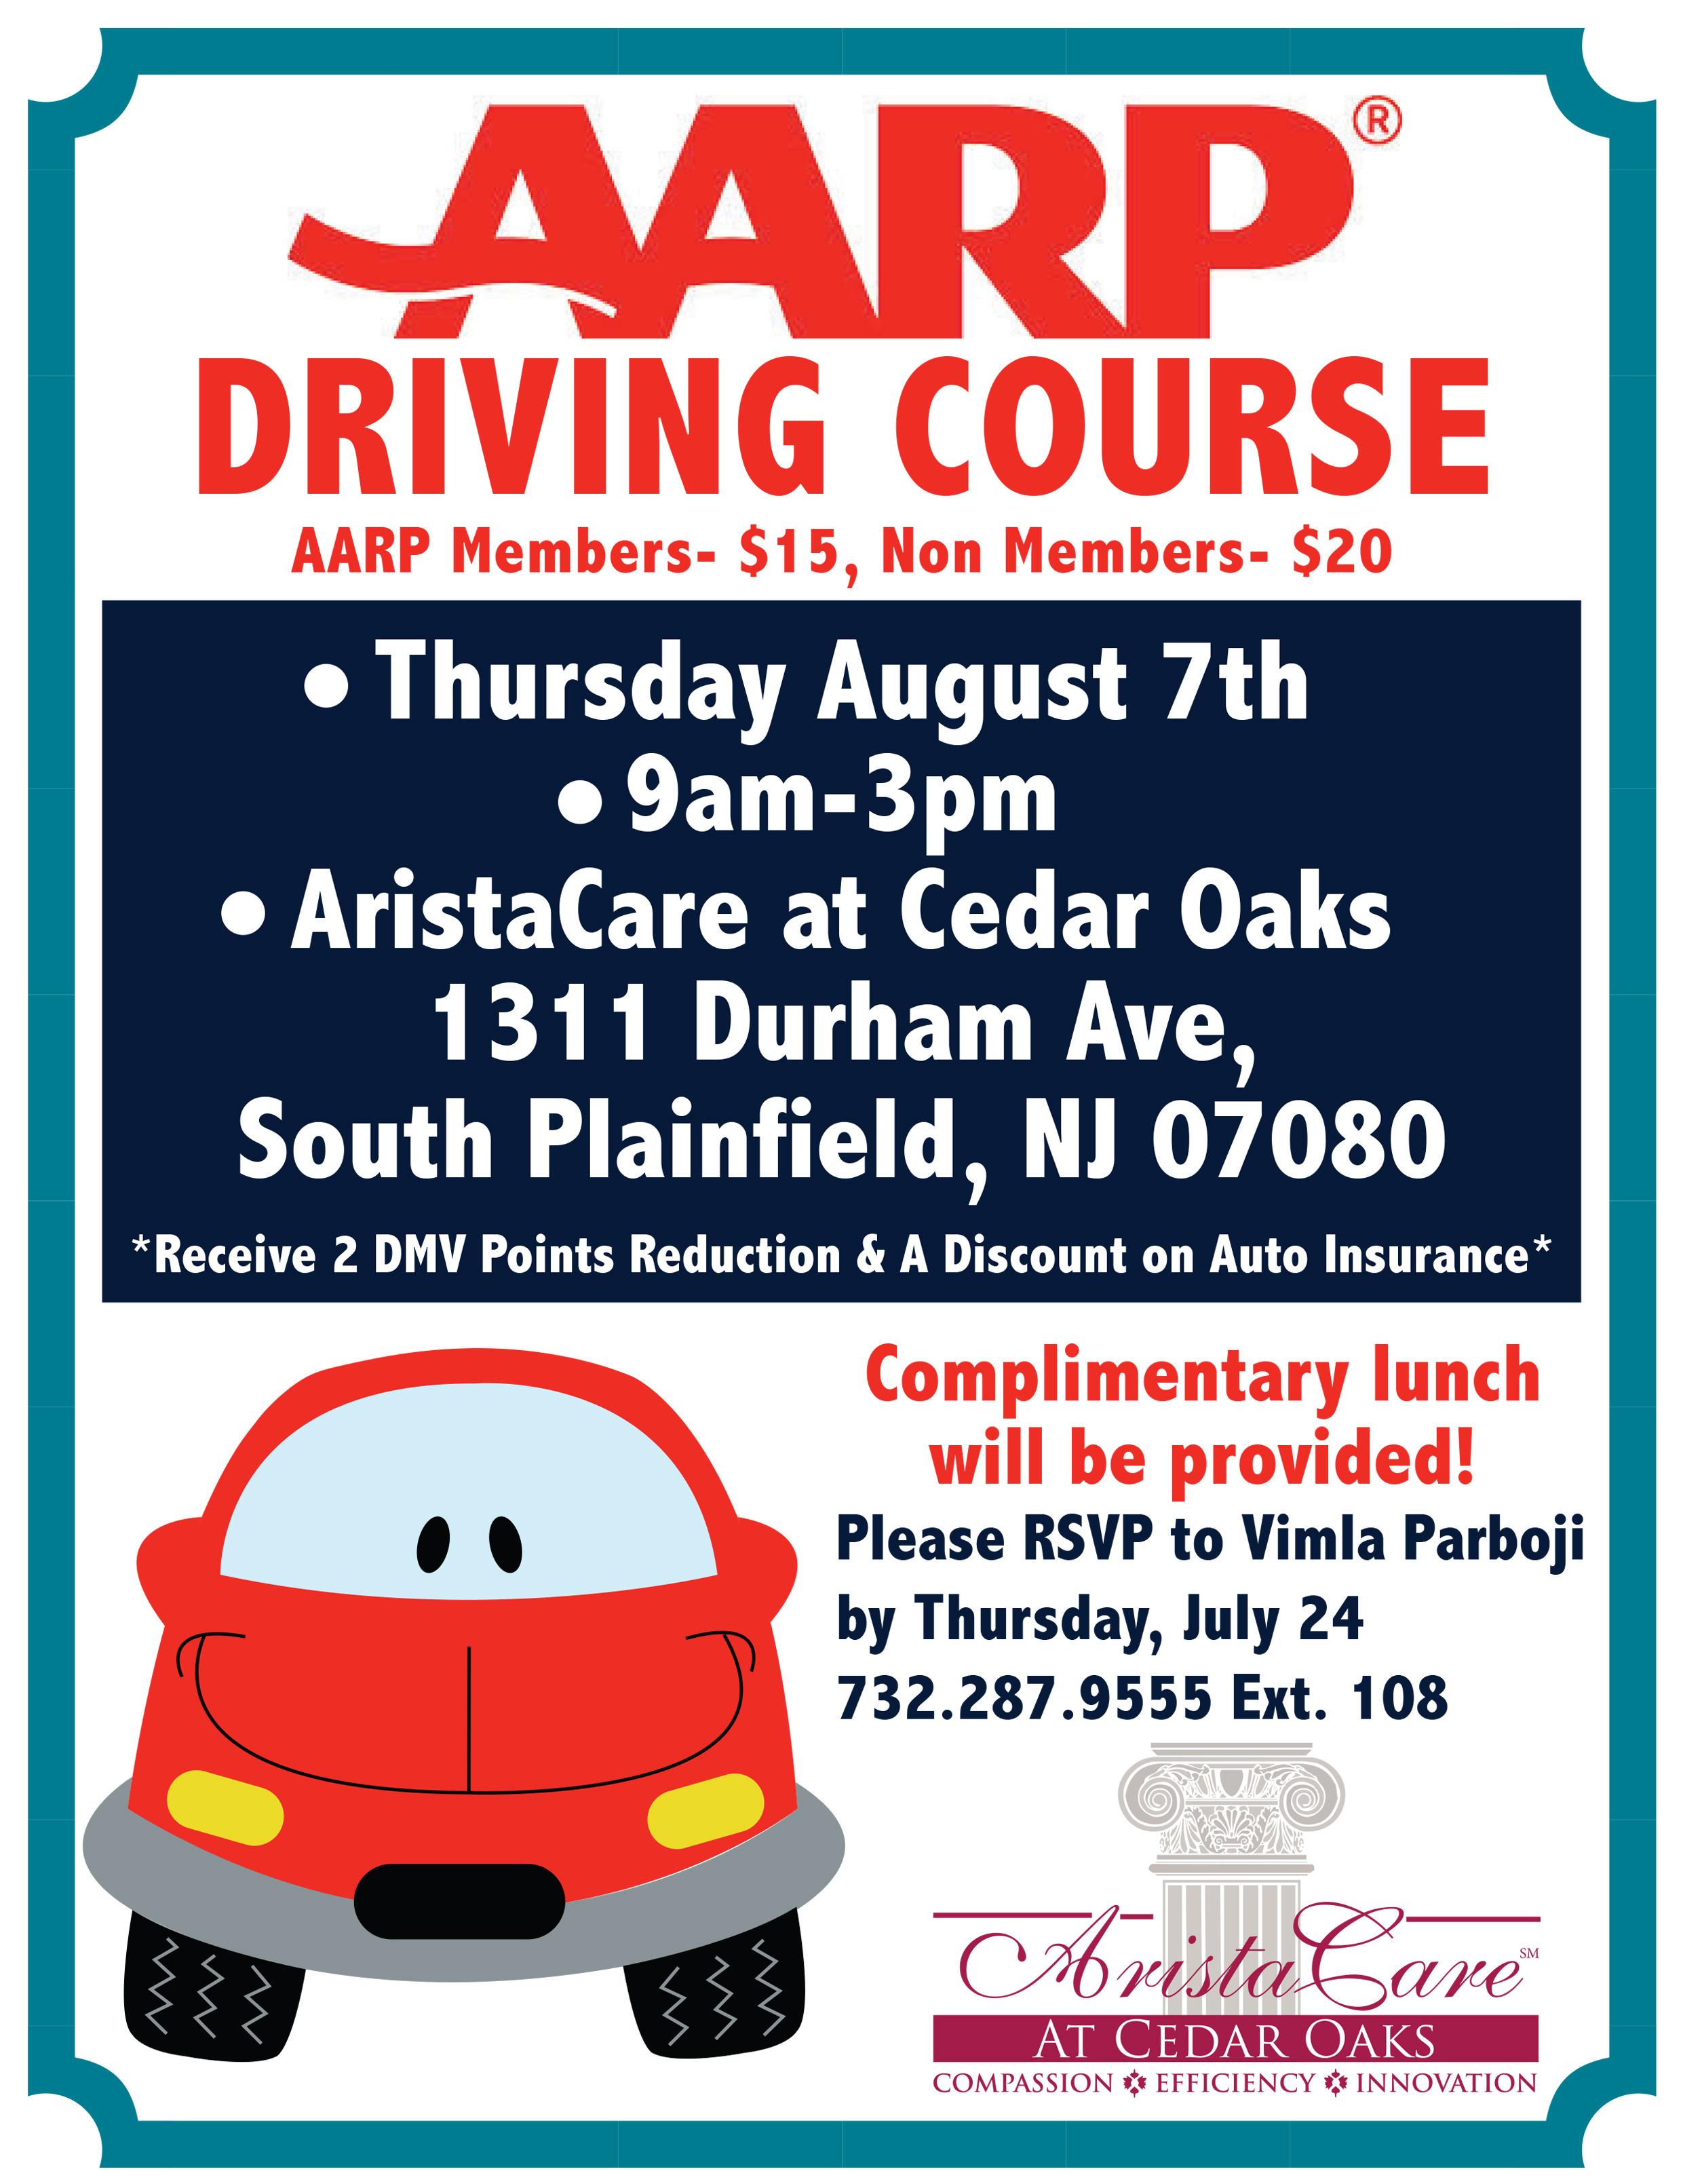 Online Defensive Driving Course Nj >> Aarp Driving Class Online Kindle Fire Hd Sale Price